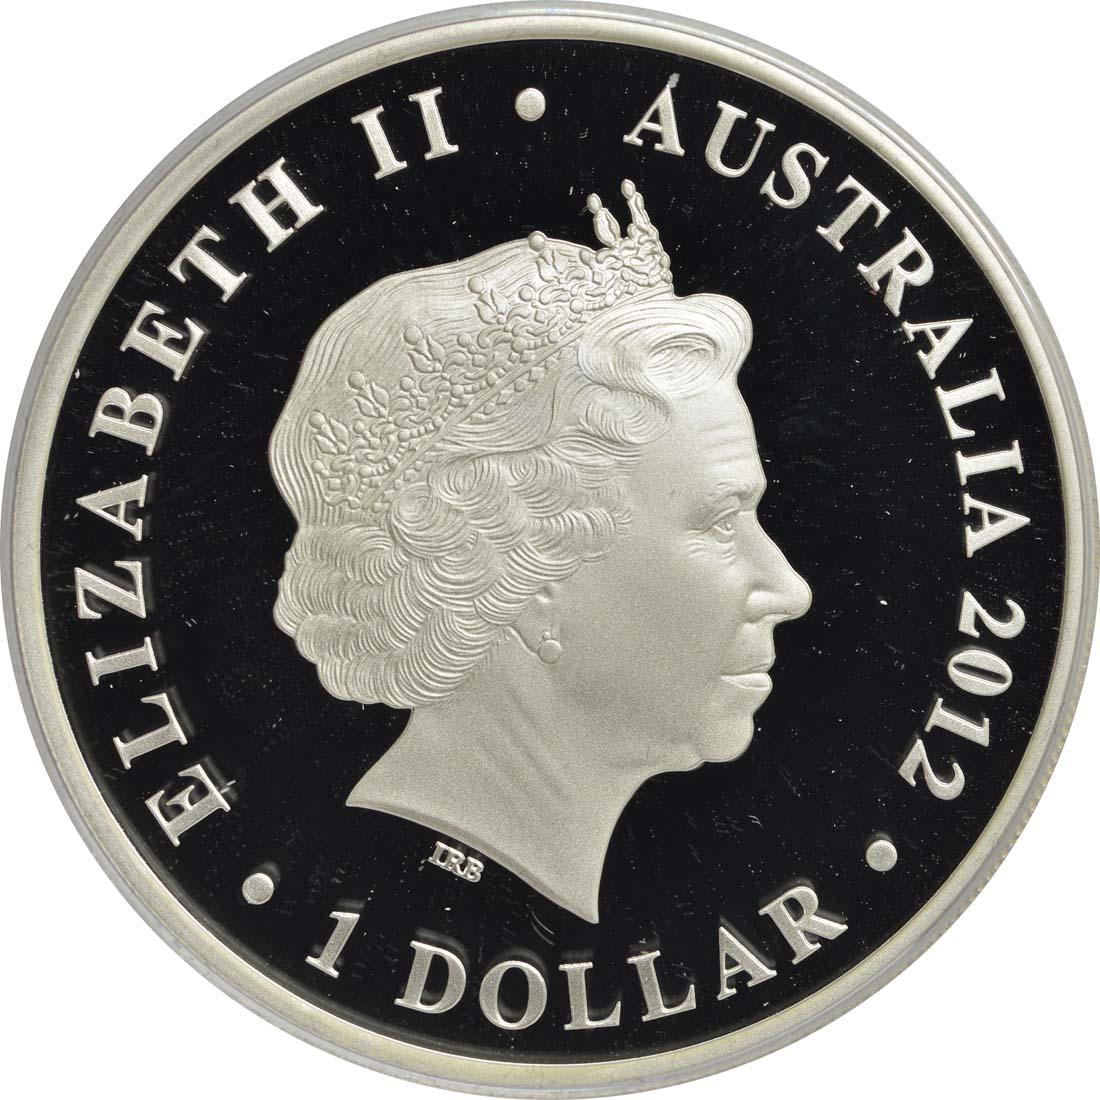 australien 1 dollar 60 kr nungsjubil um queen elisabeth farbig 2012 silber pp euro. Black Bedroom Furniture Sets. Home Design Ideas